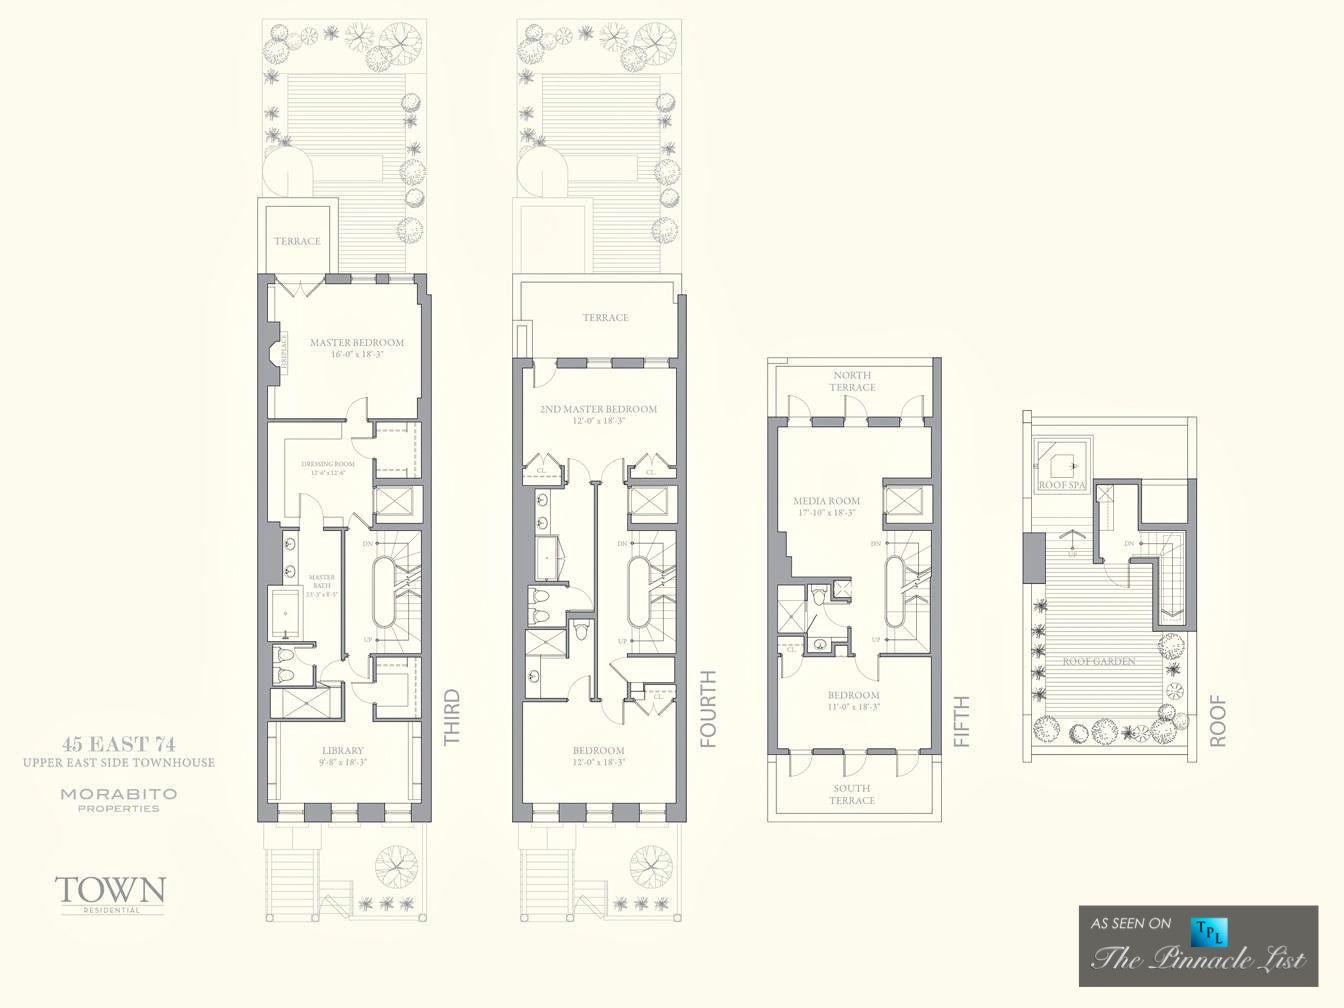 new york townhouse floor plans. Floor Plan  26 Million Upper East Side Townhouse 45 74th St New